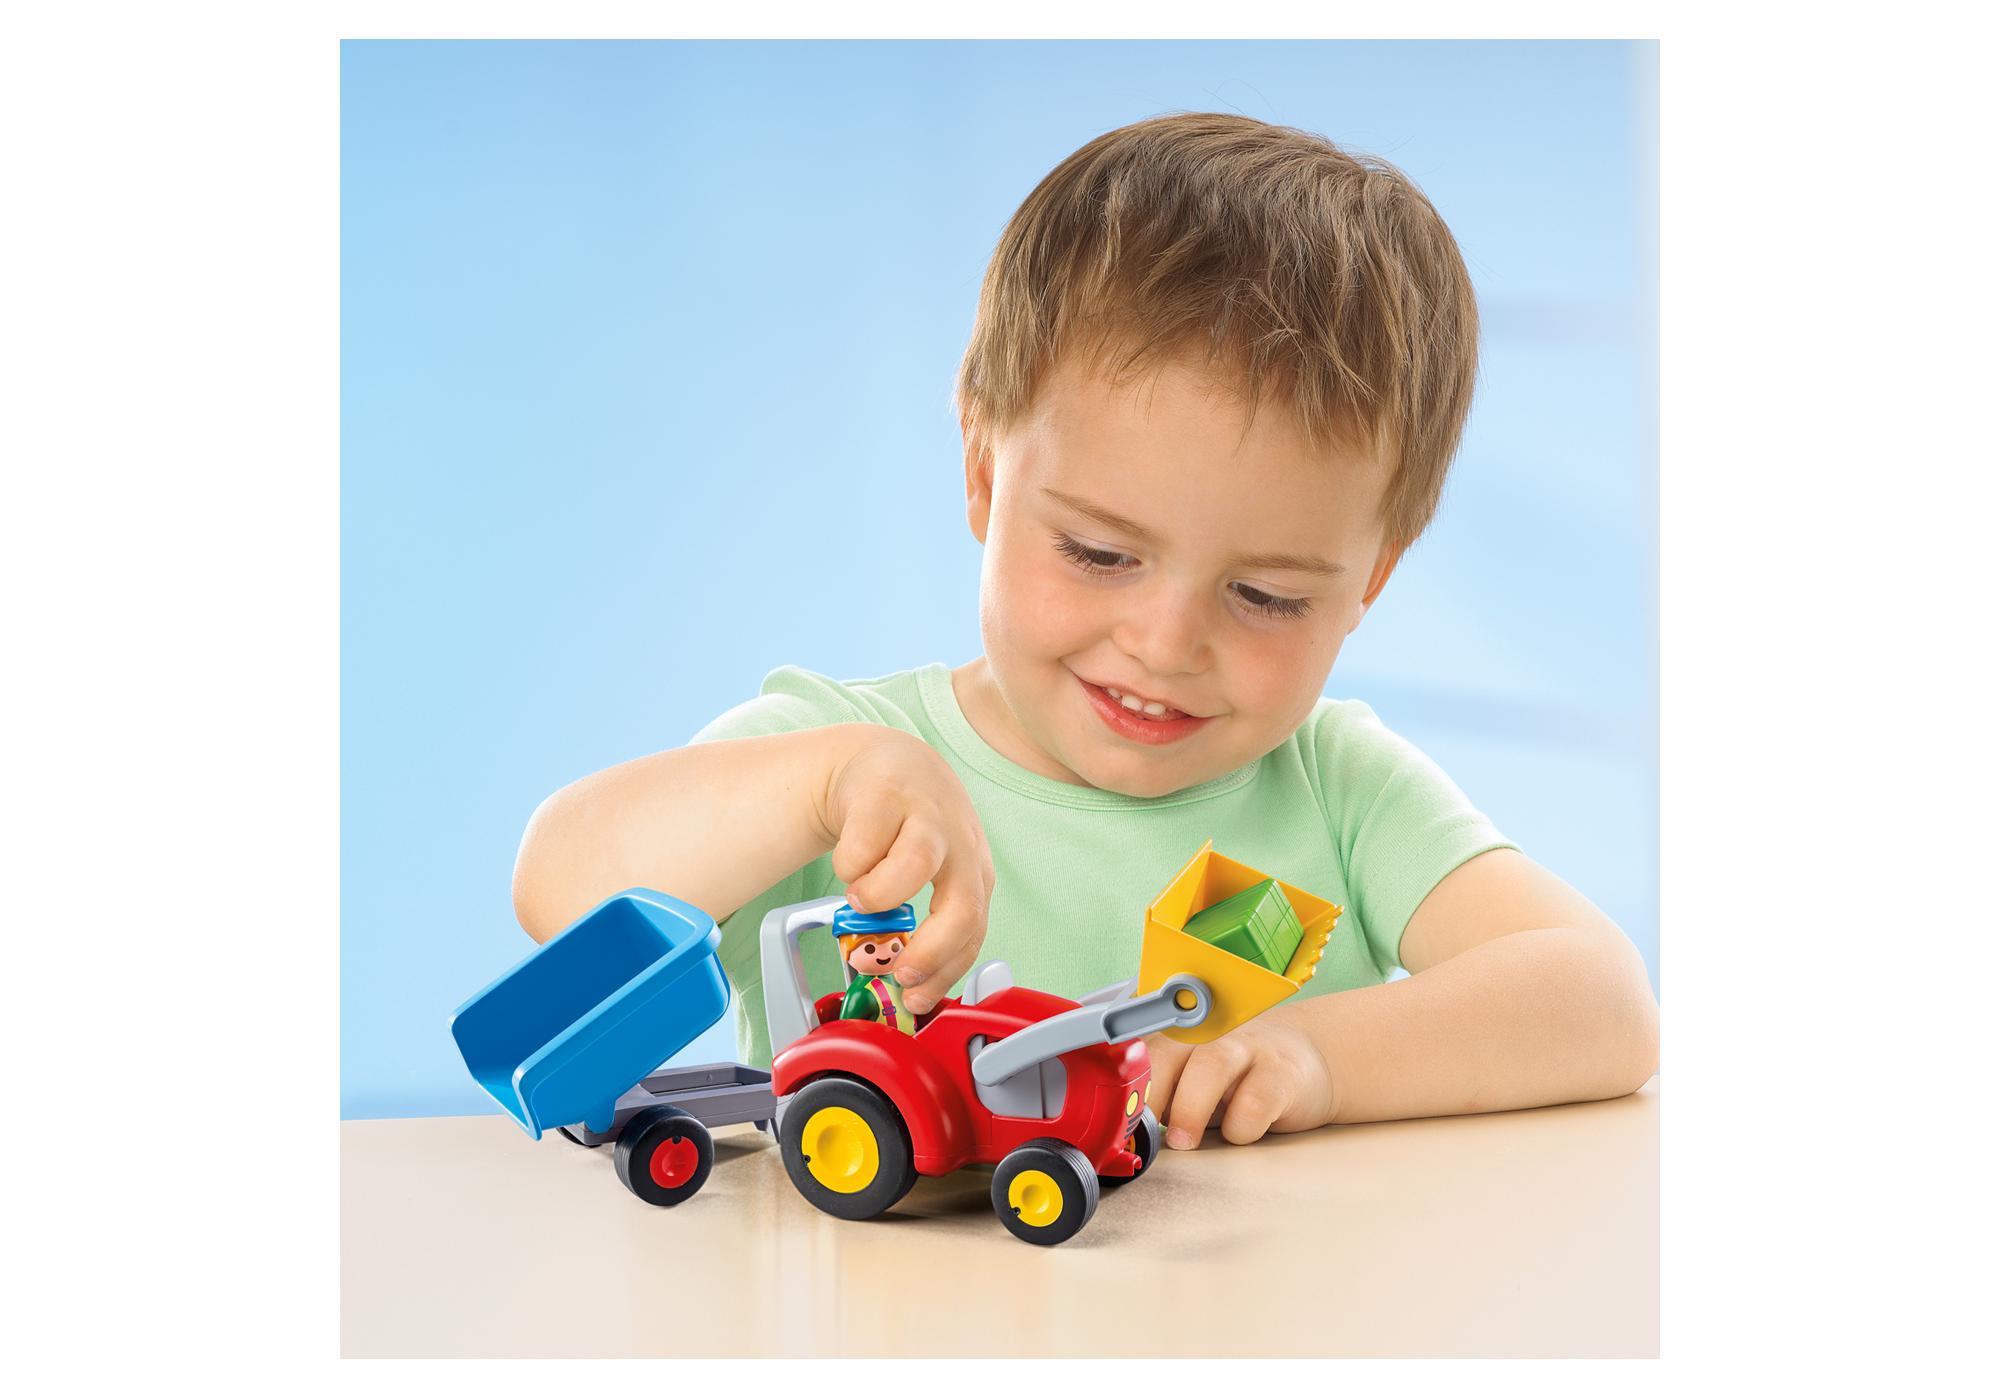 http://media.playmobil.com/i/playmobil/6964_product_extra1/1.2.3 Tractor con Remolque